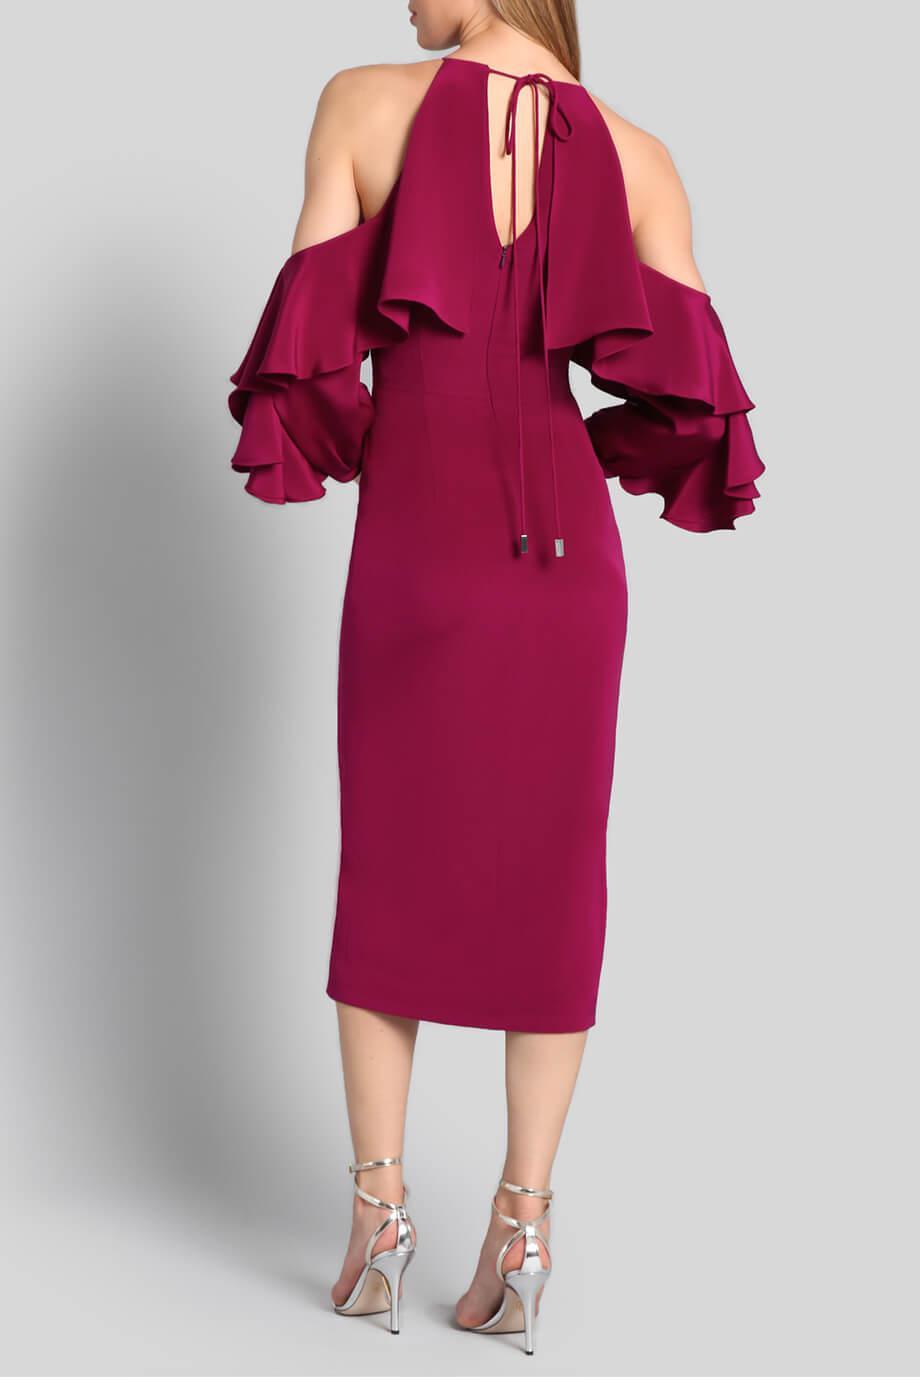 Venta Shoulder Ochs Condyc Et Dress Descuento línea Aura Cold Cushnie en IZx7qO0nwI